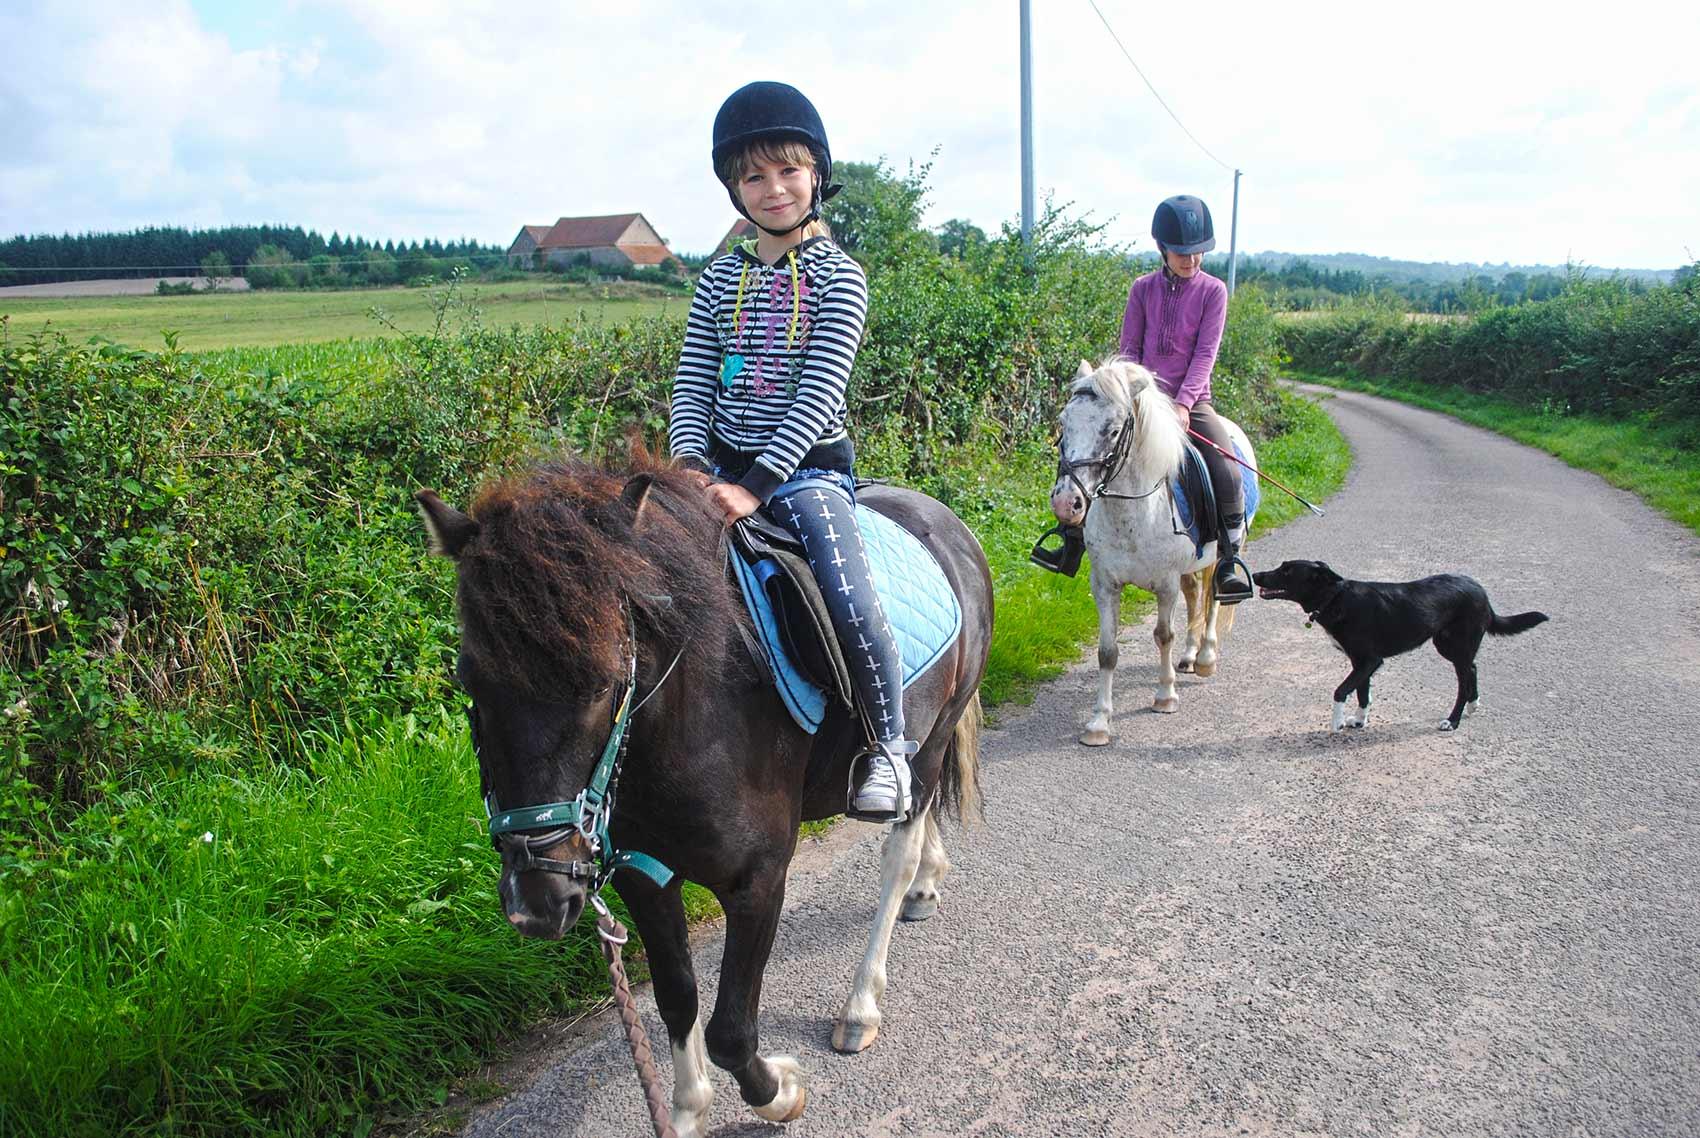 Activiteiten, pony rijden